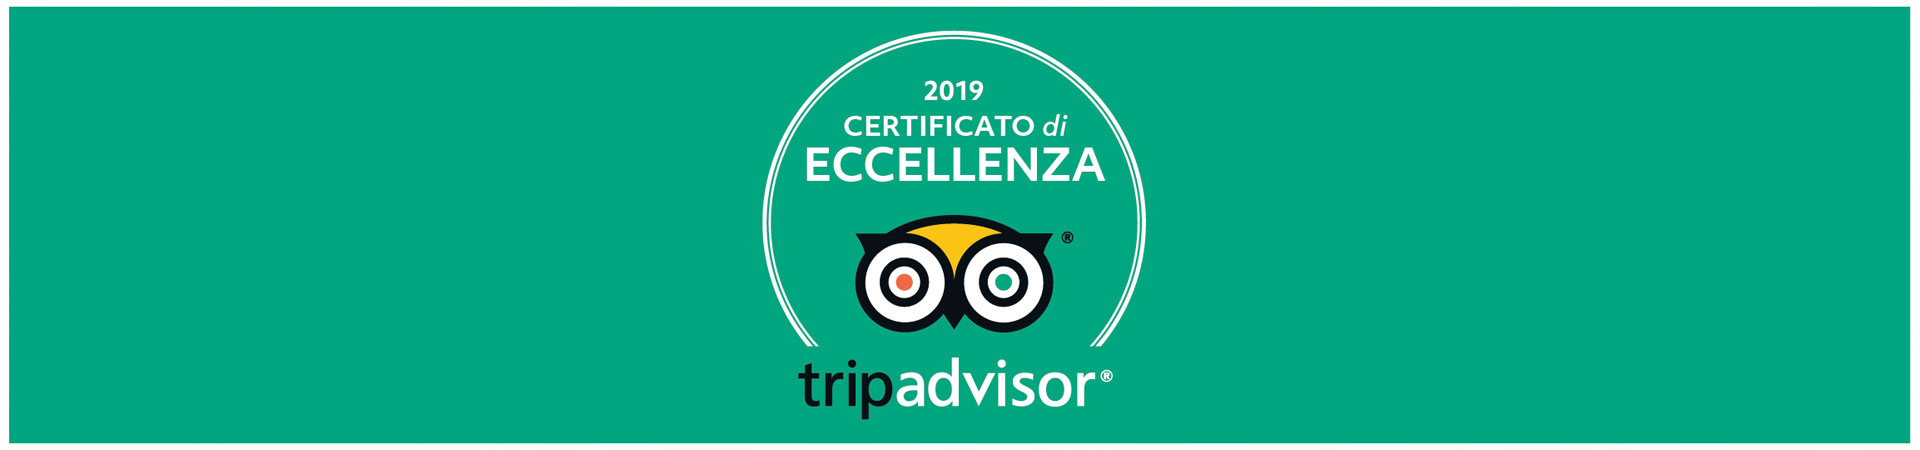 Certificato tripadvisor 2019